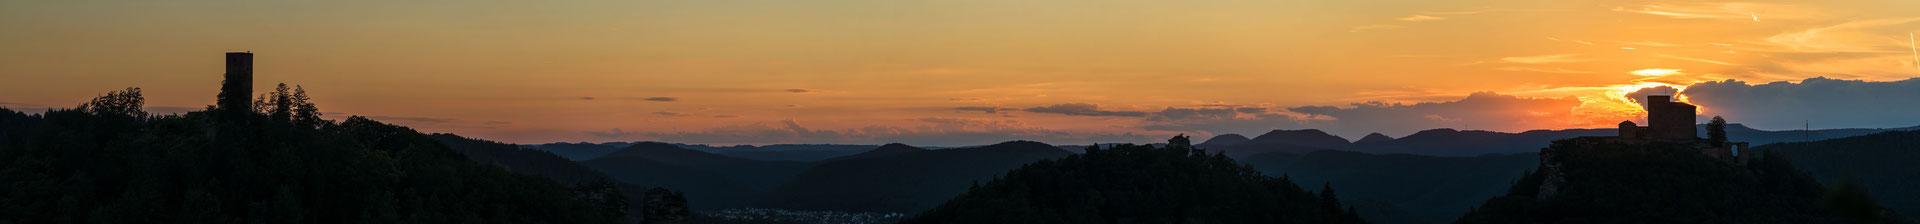 Sonnenuntergang am Slevogtfels